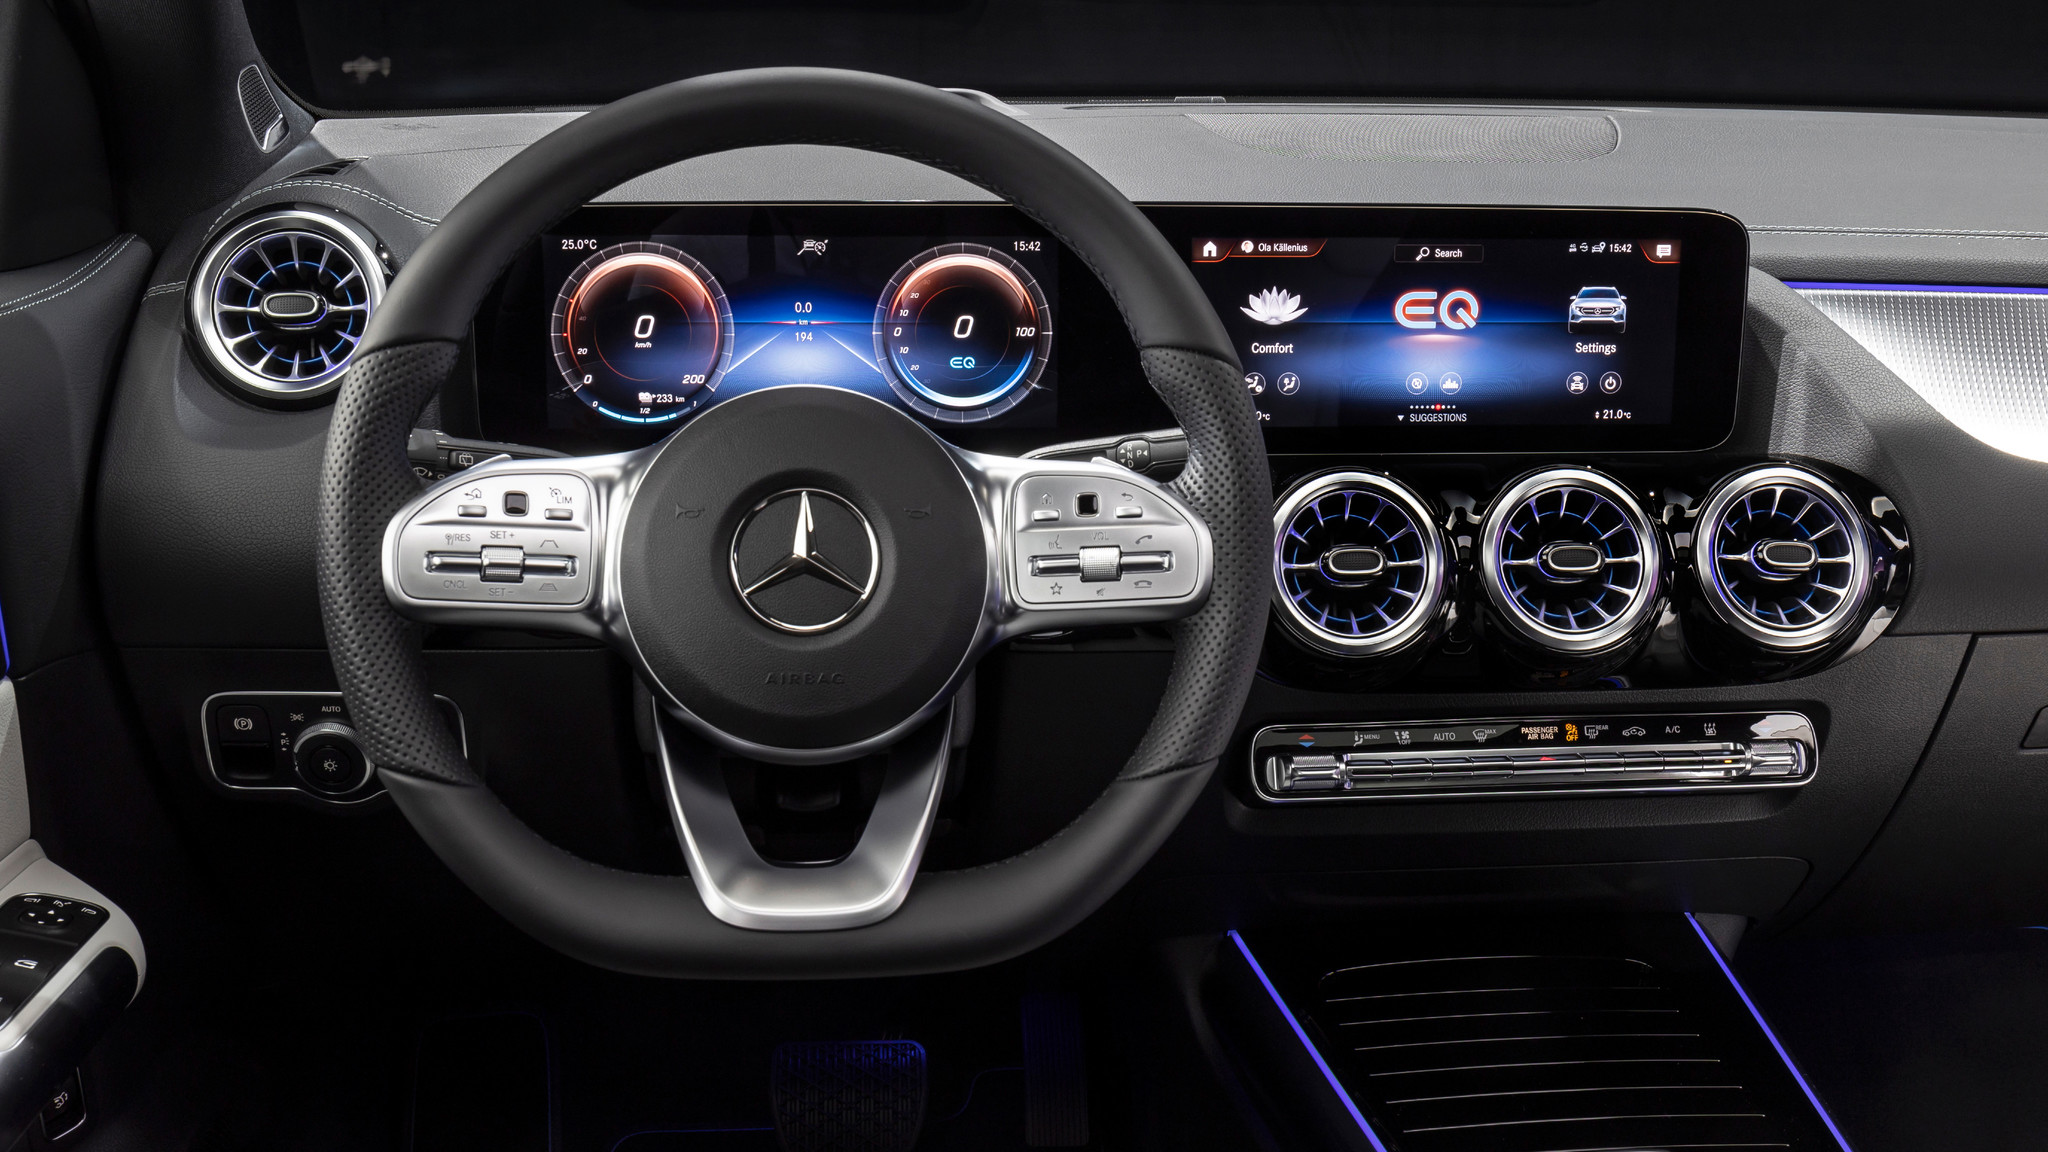 El visualizador de medios tiene la estructura de paneles típica de Mercedes-EQ.